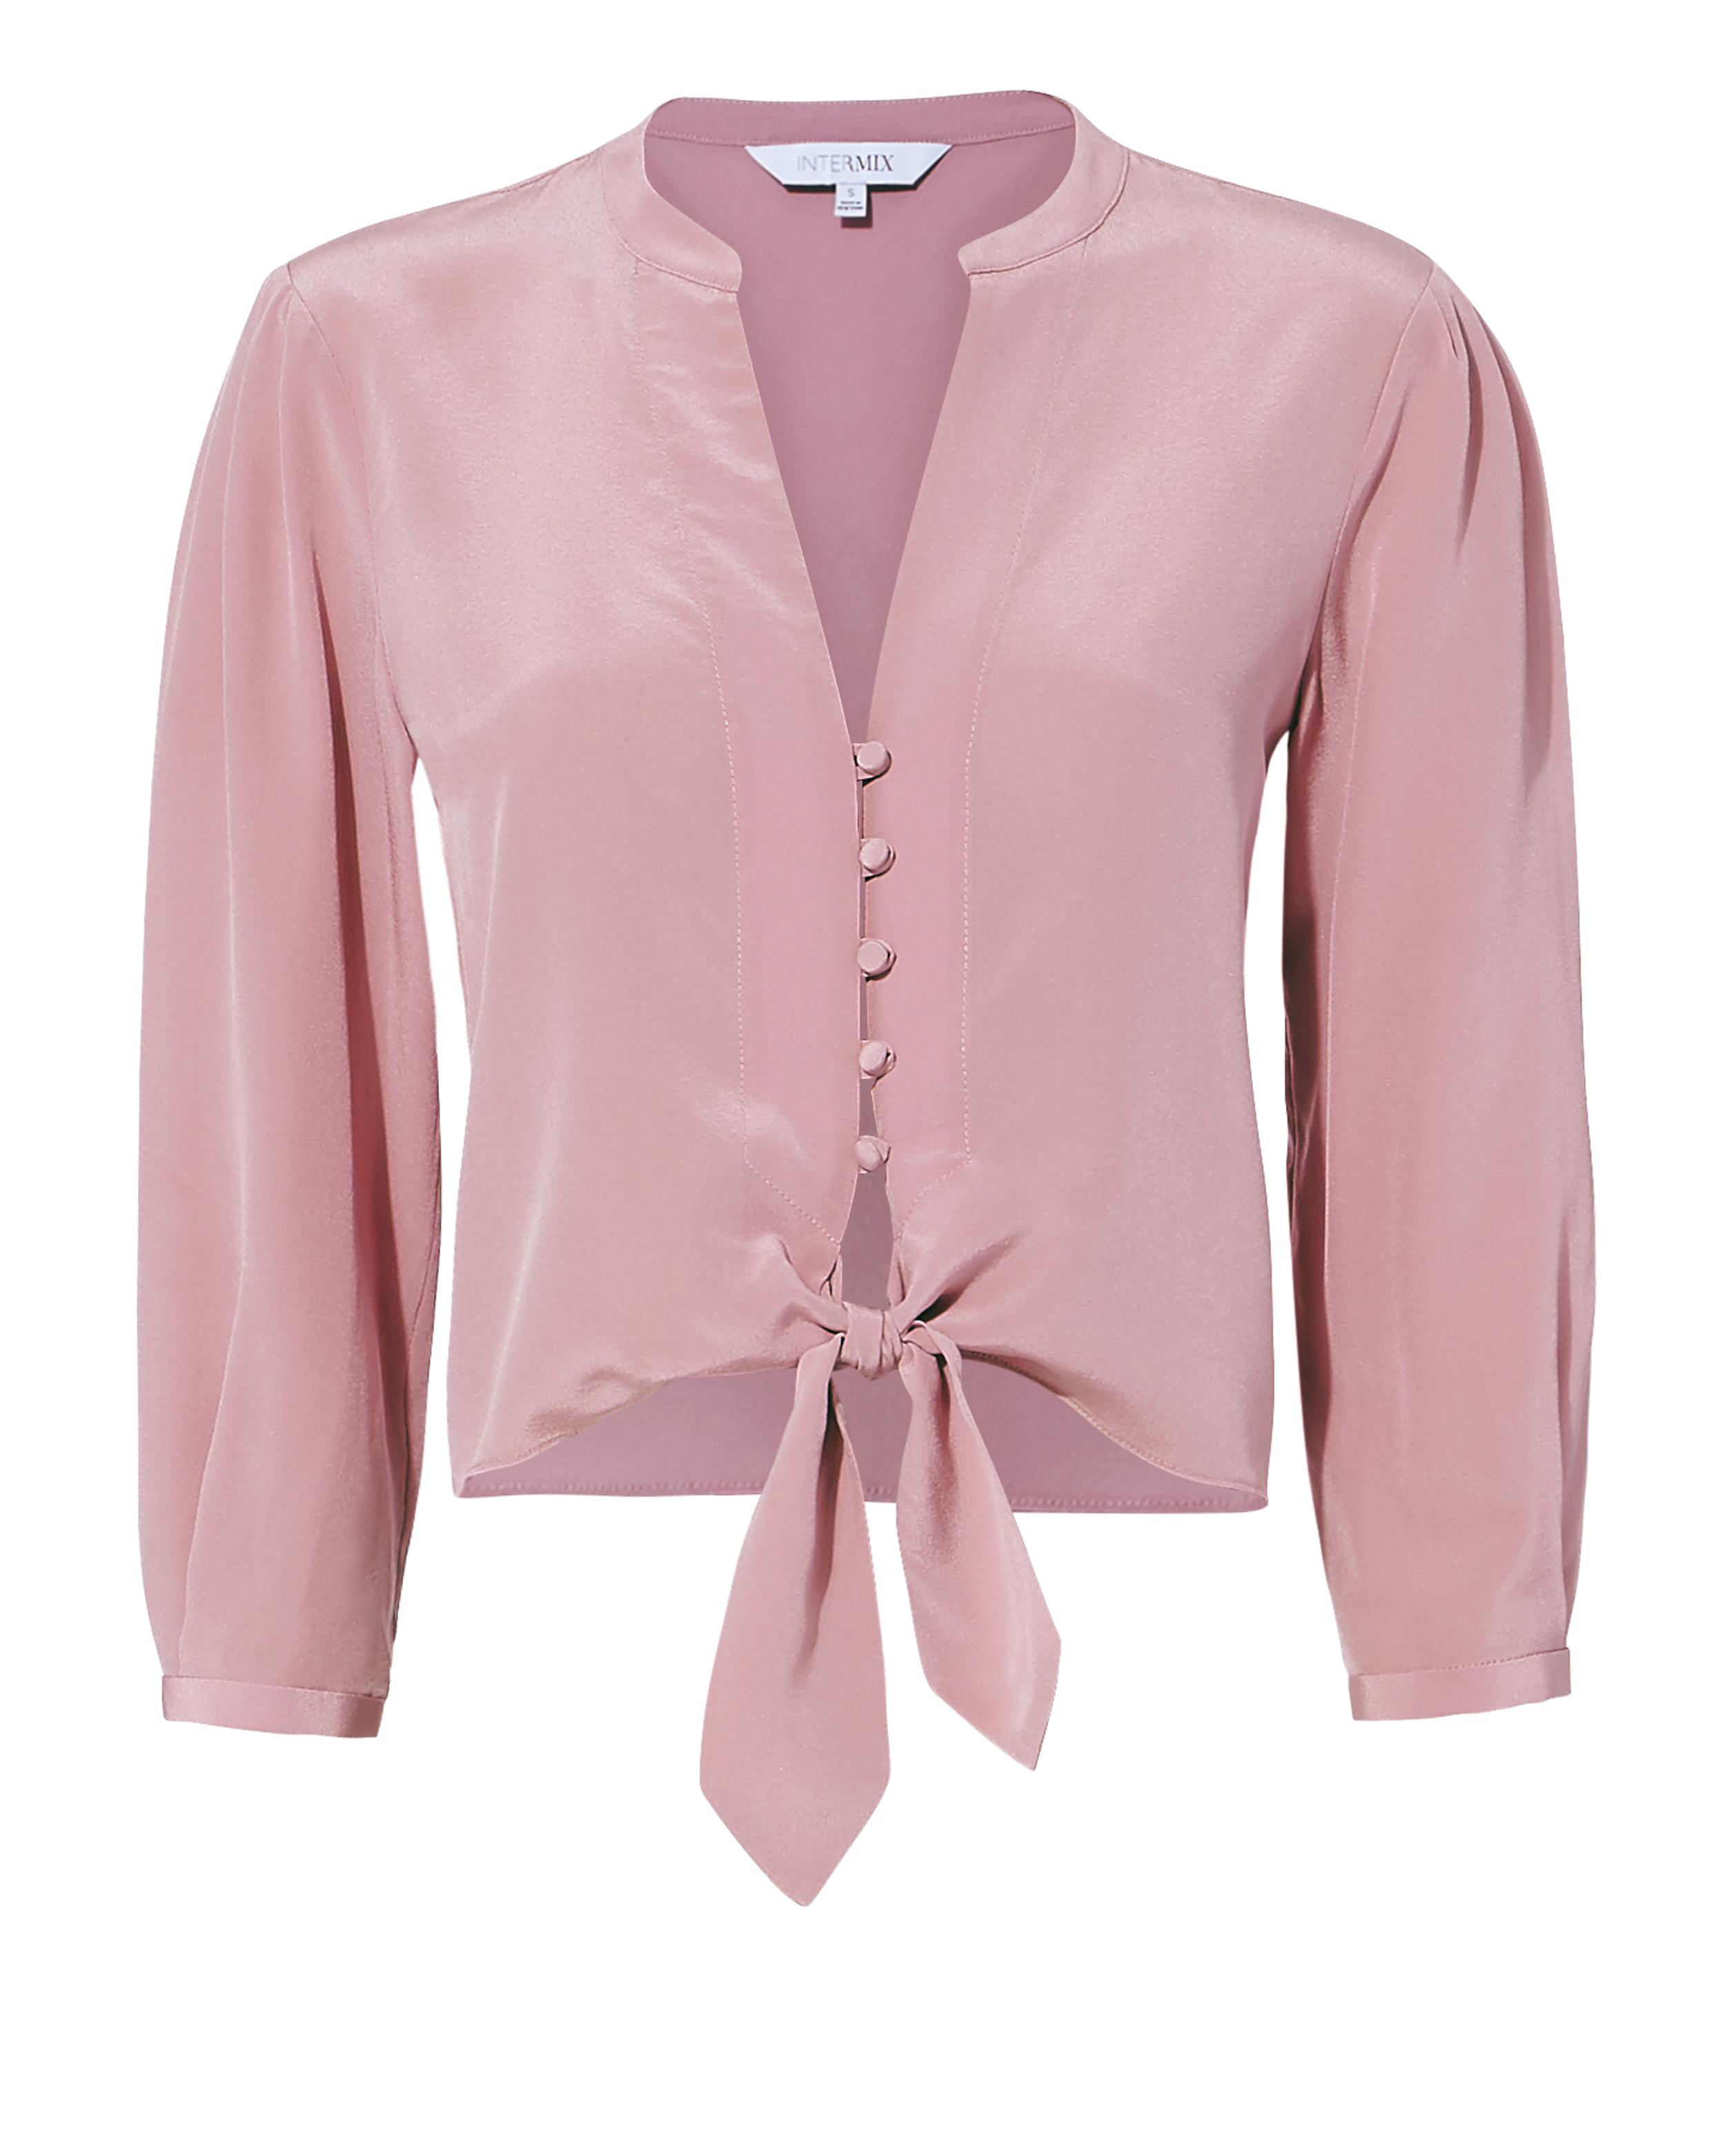 Violetta Tie Front Blouse by Intermix